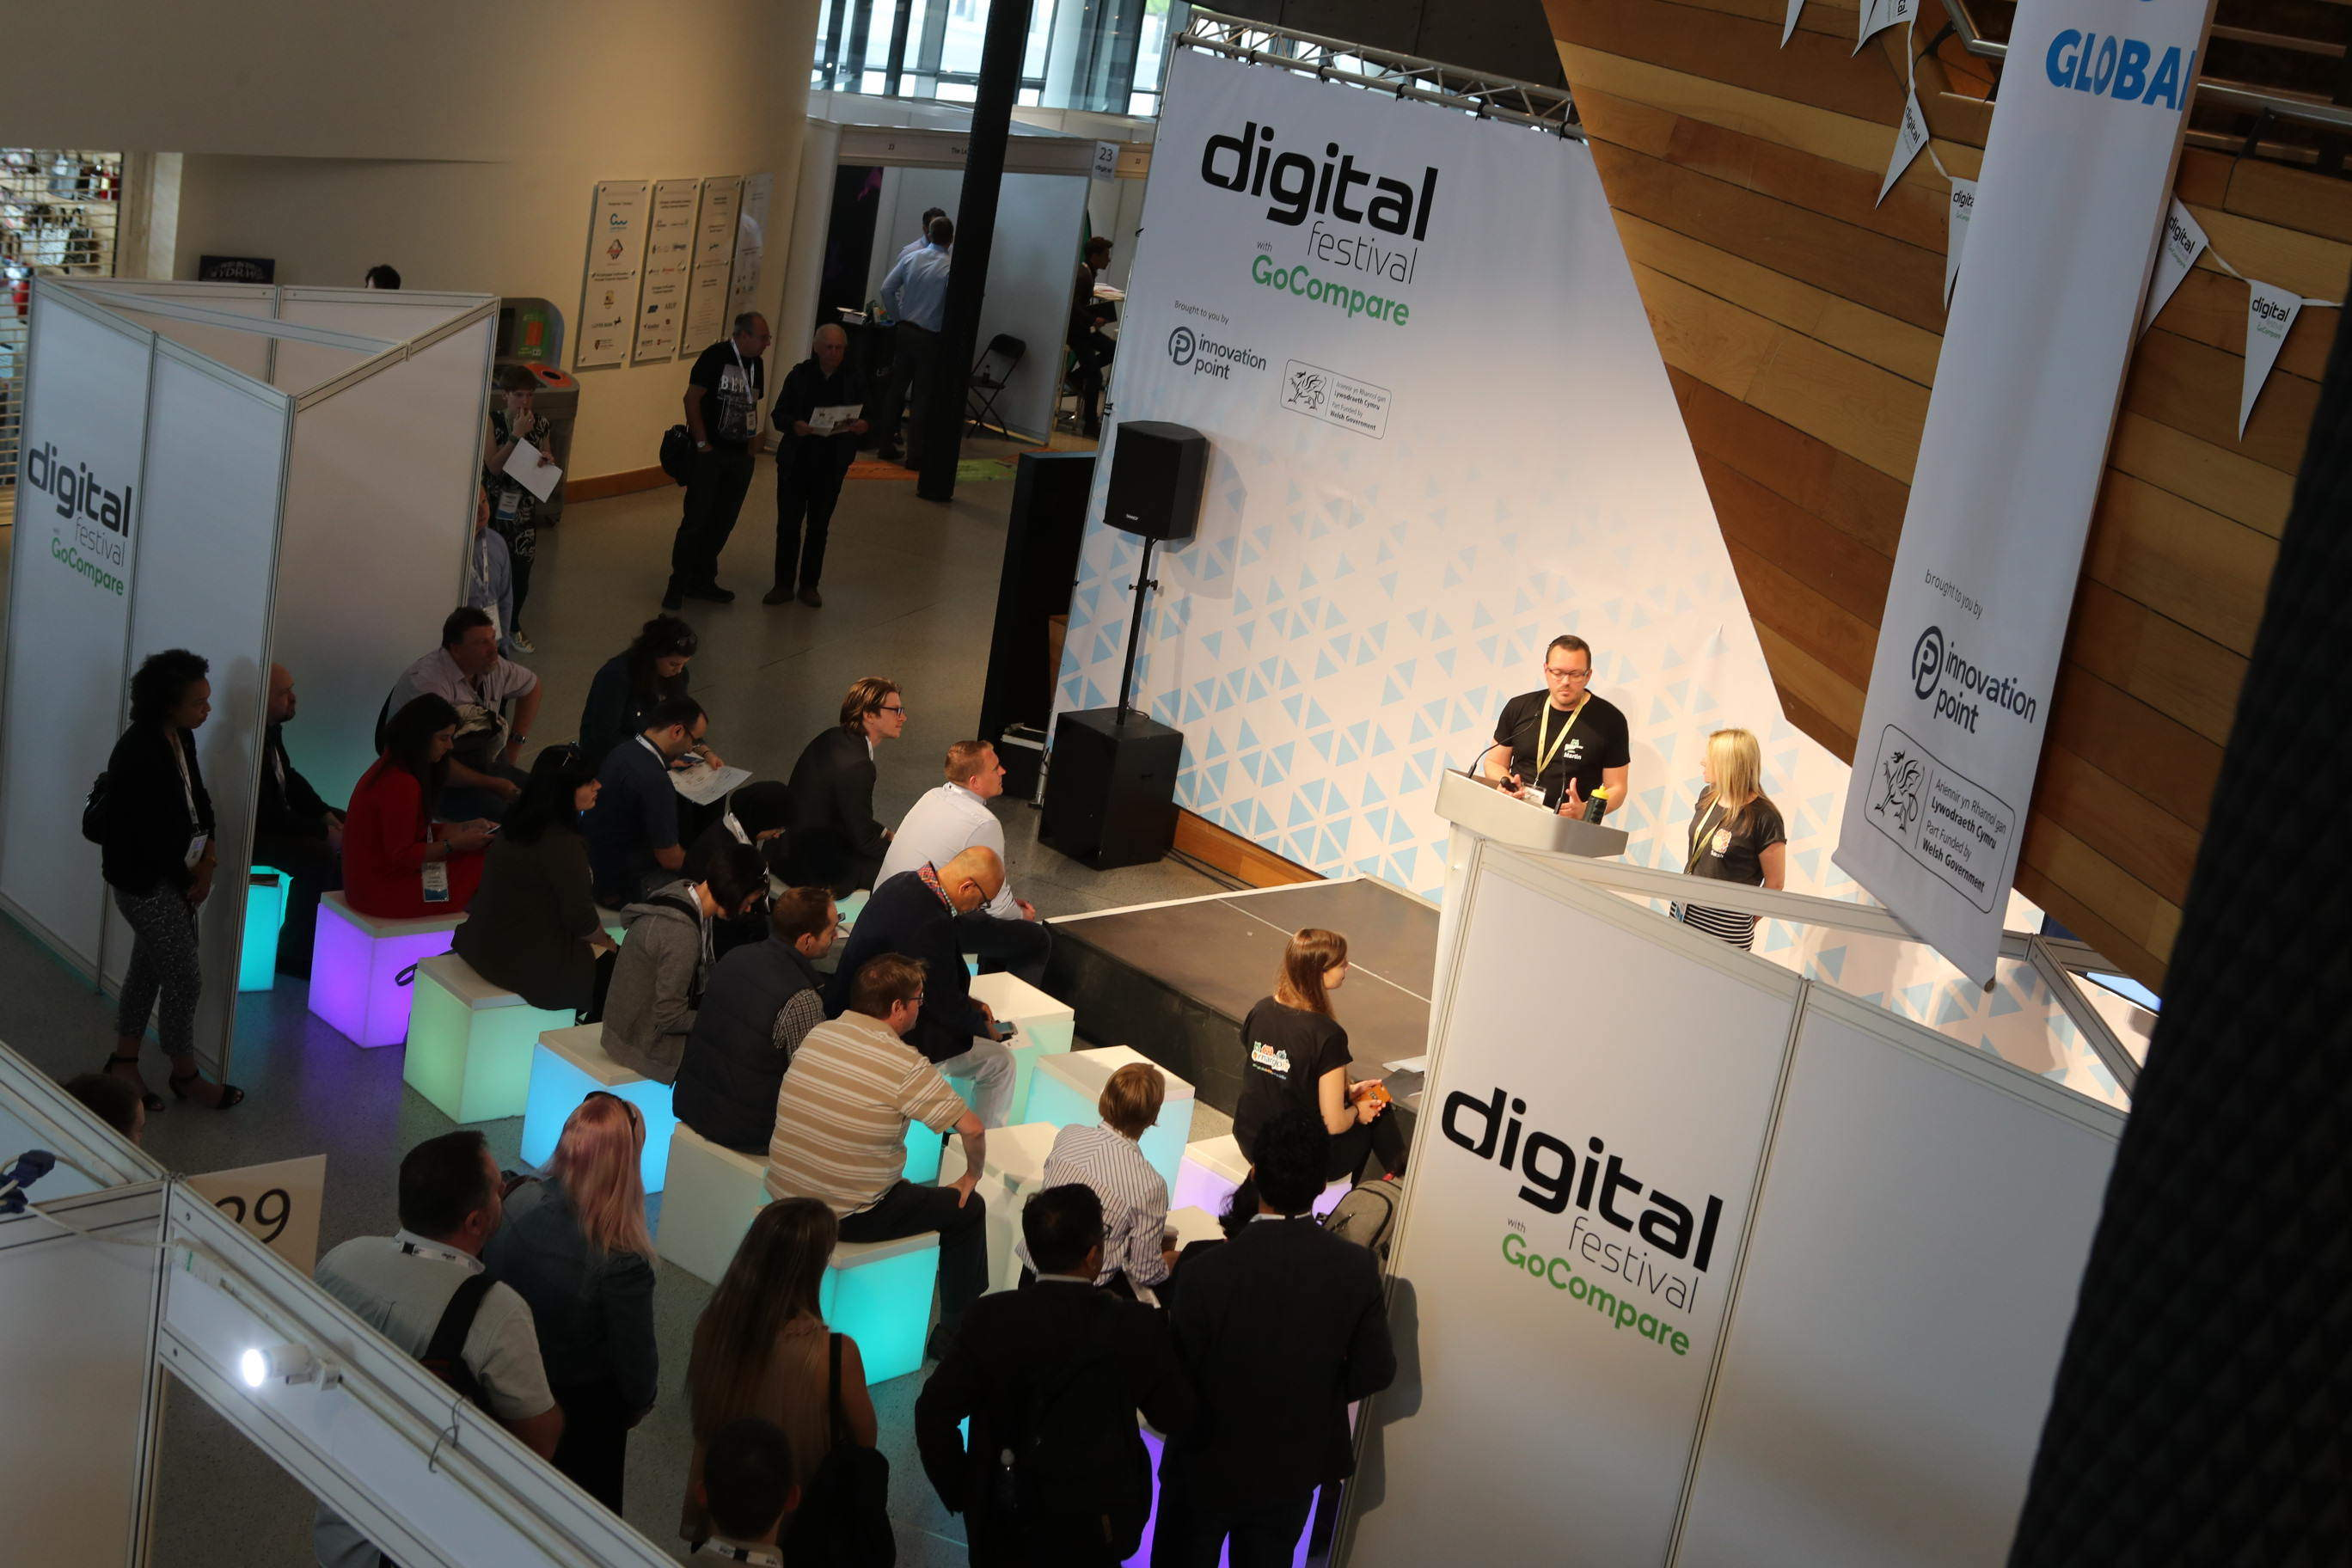 Digital Festival 2018